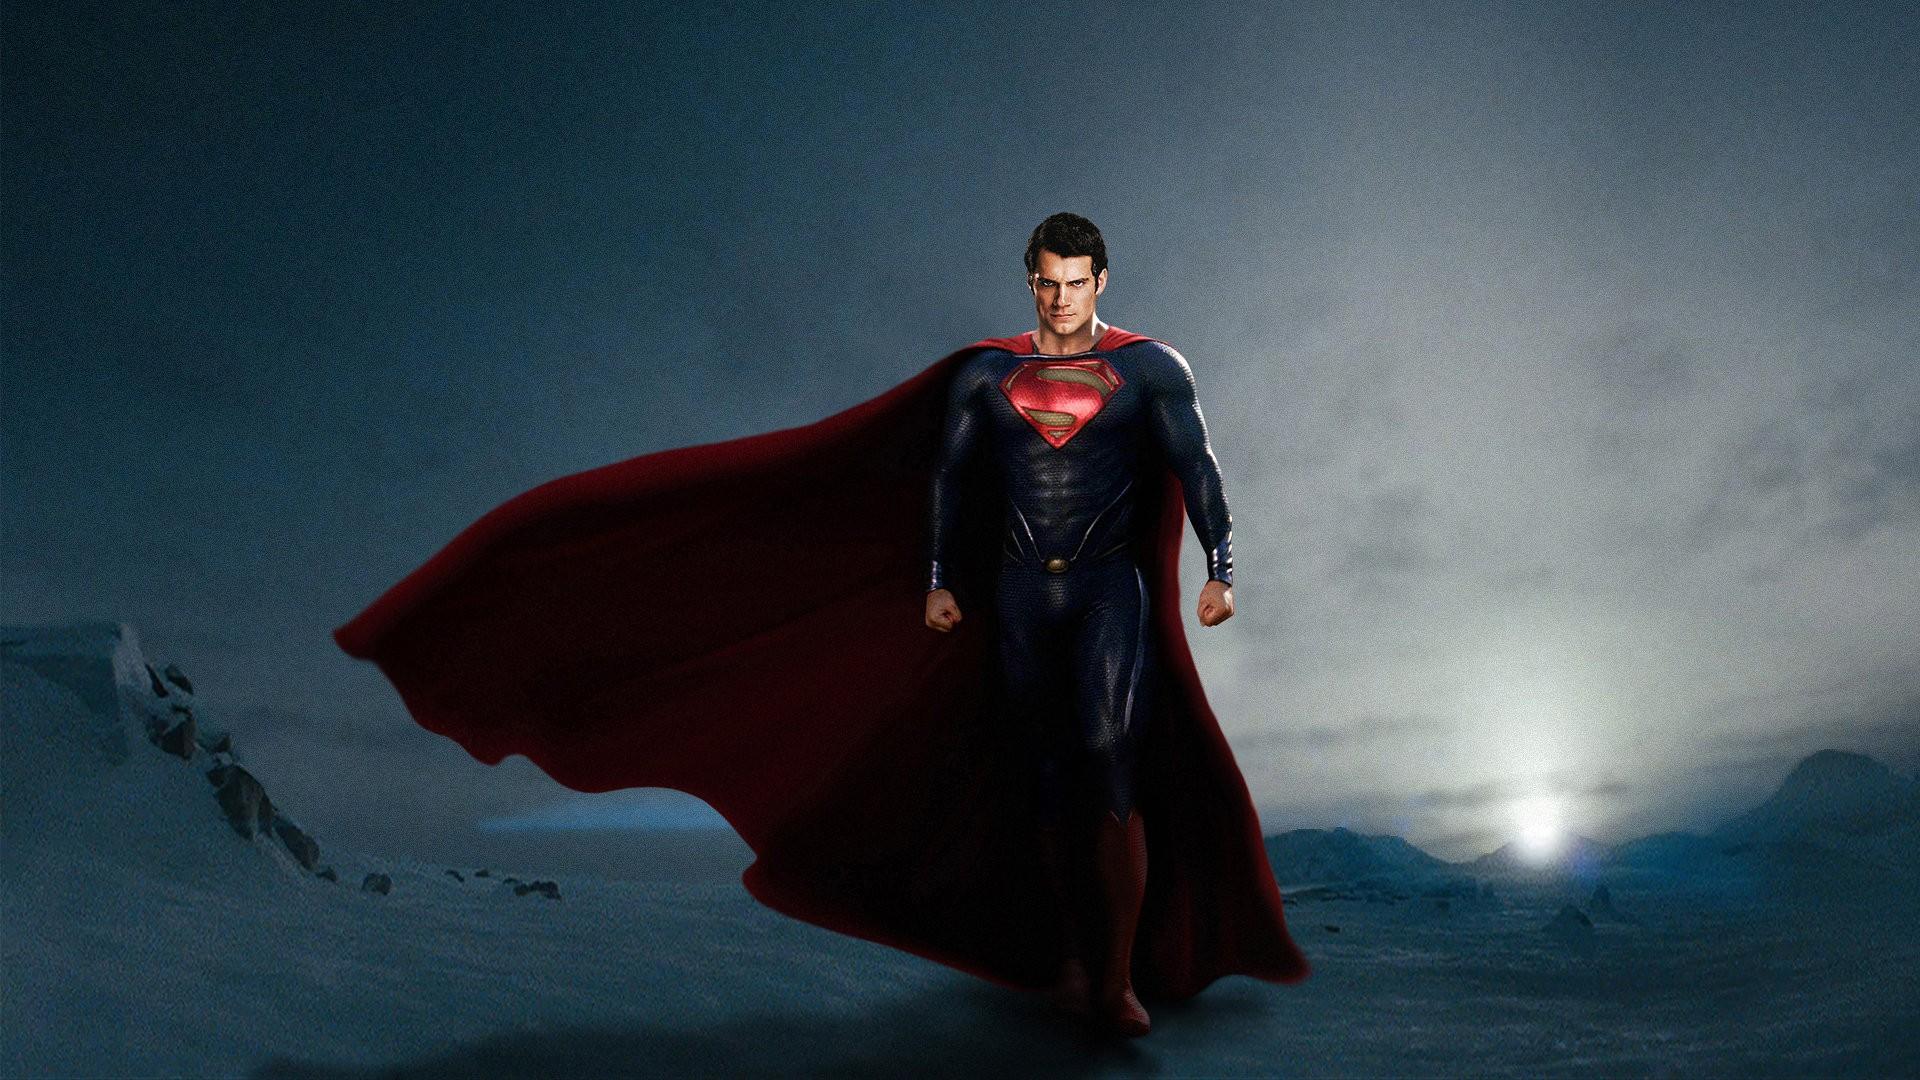 superman el hombre de acero trailer vfx